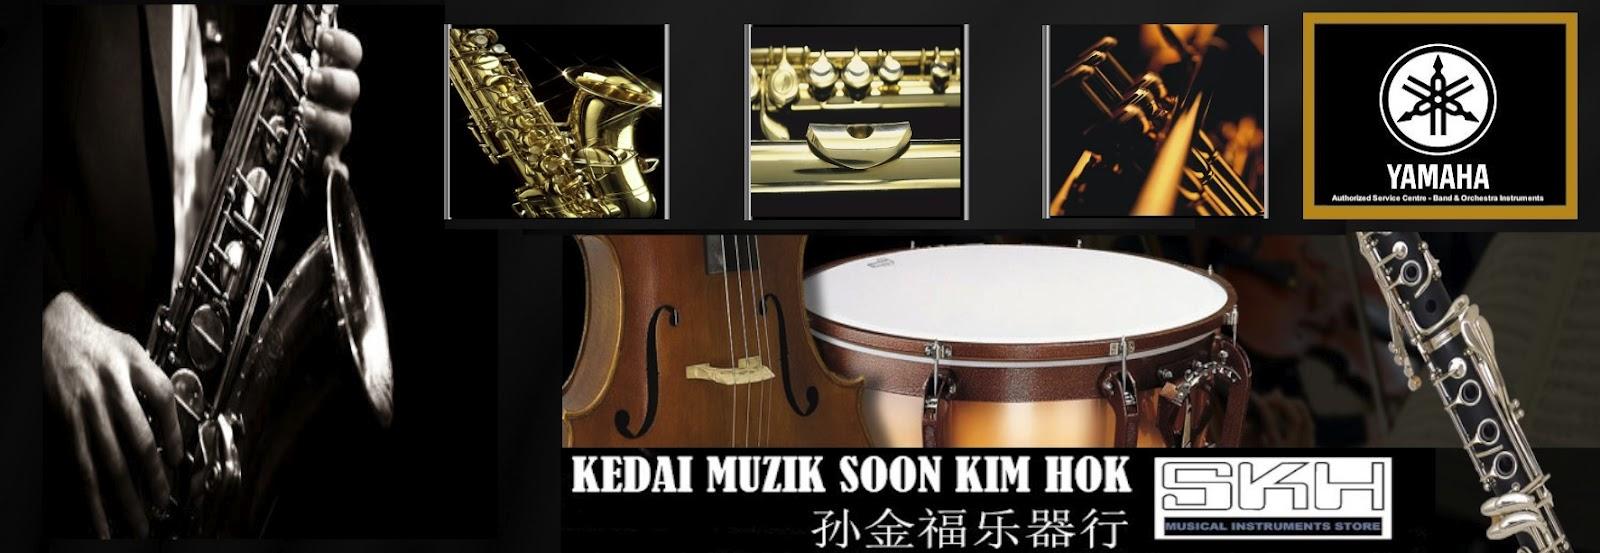 KEDAI MUZIK SOON KIM HOK 孙金福乐器行 MUSICAL INSTRUMENTS